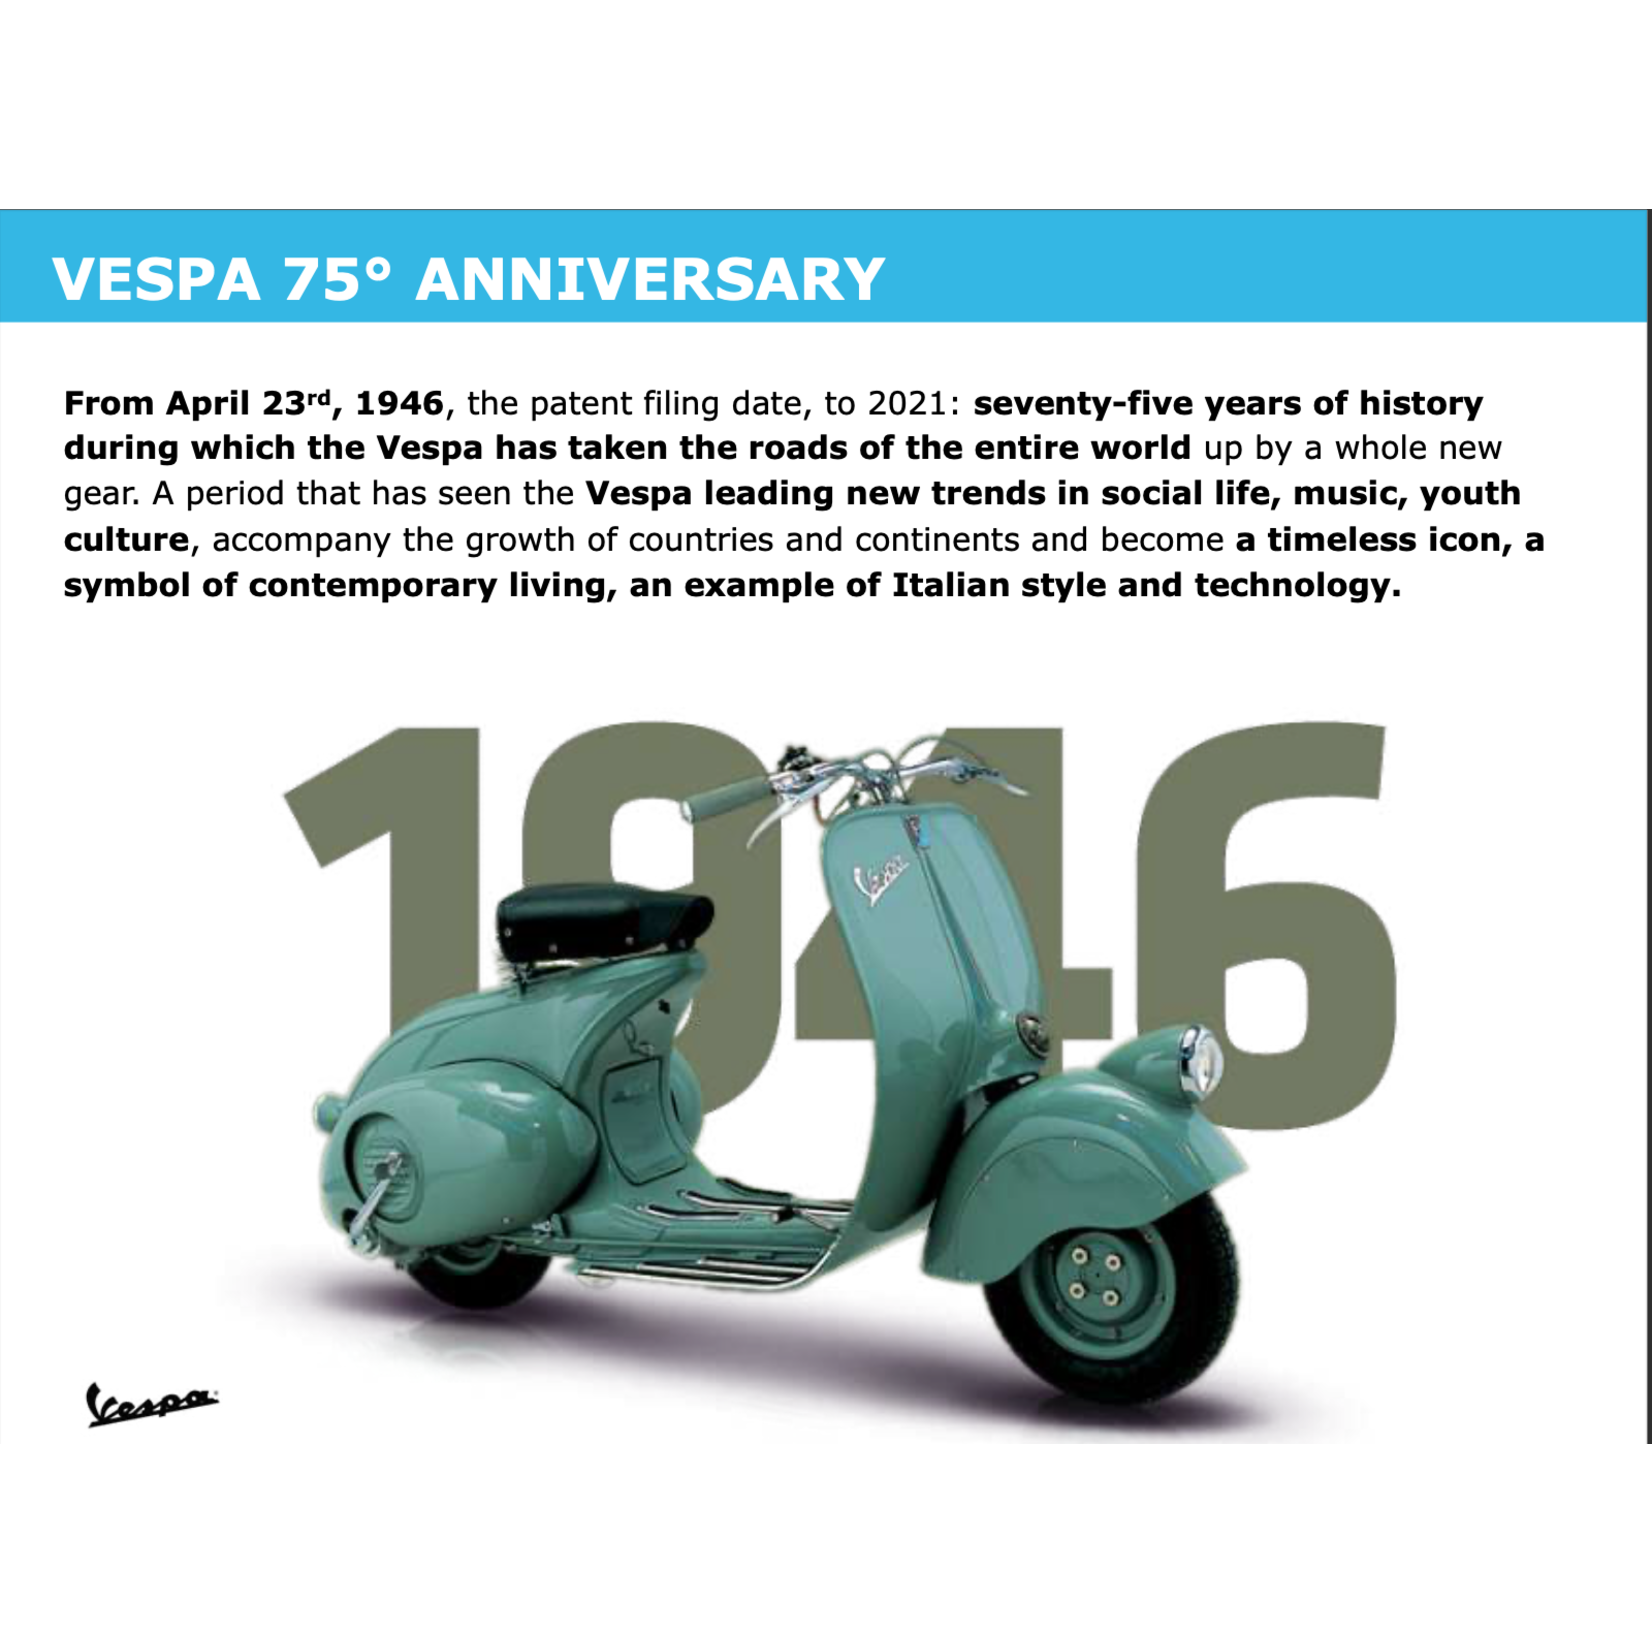 Vehicles Vespa, 2021 Primavera 50 75th Anniversary Celebration